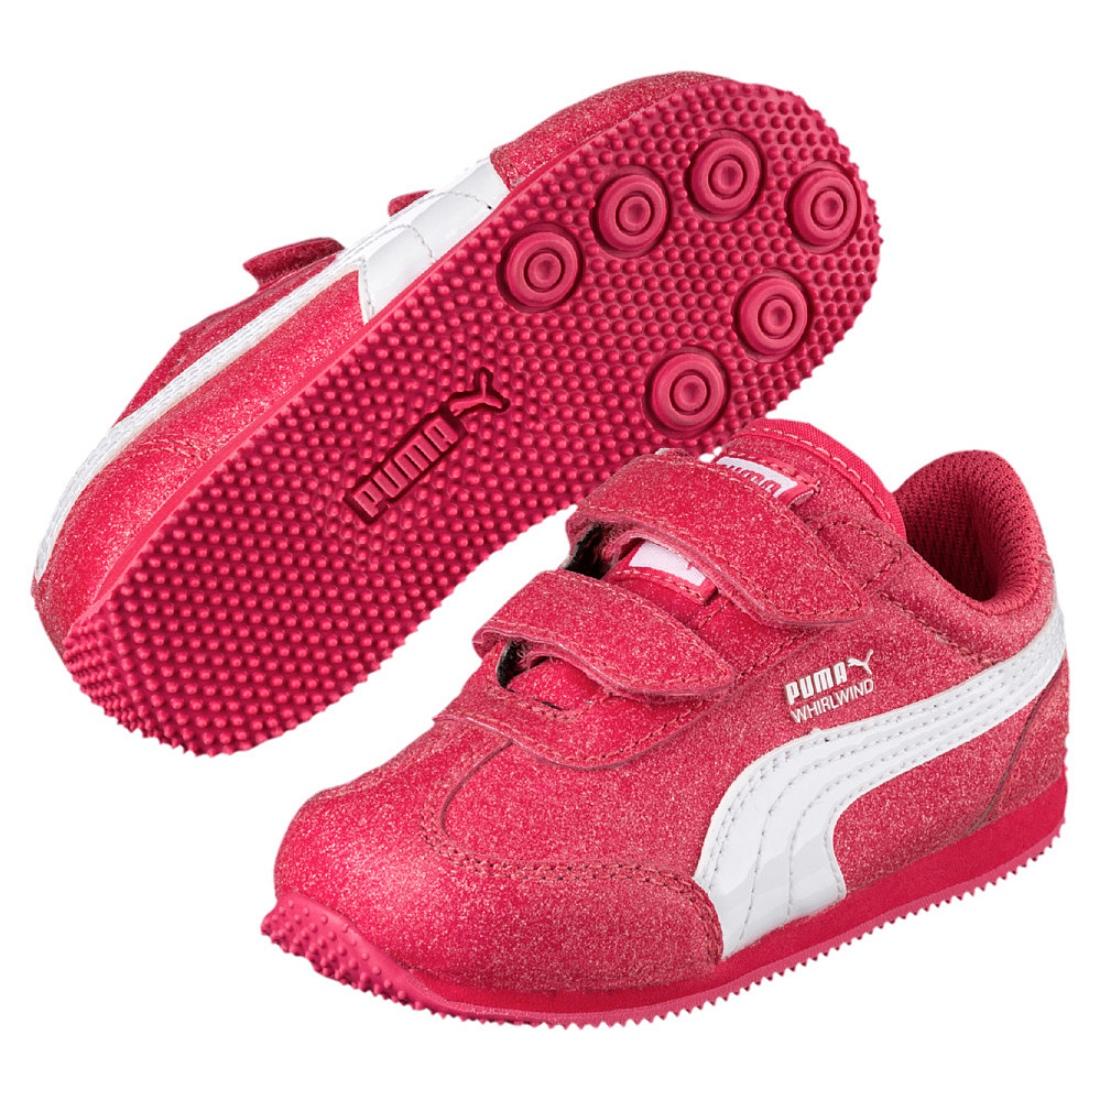 Whirlwind Schuhe Mädchen Puma V Sneaker Glitz Paradies Kinder Inf A4LjR5